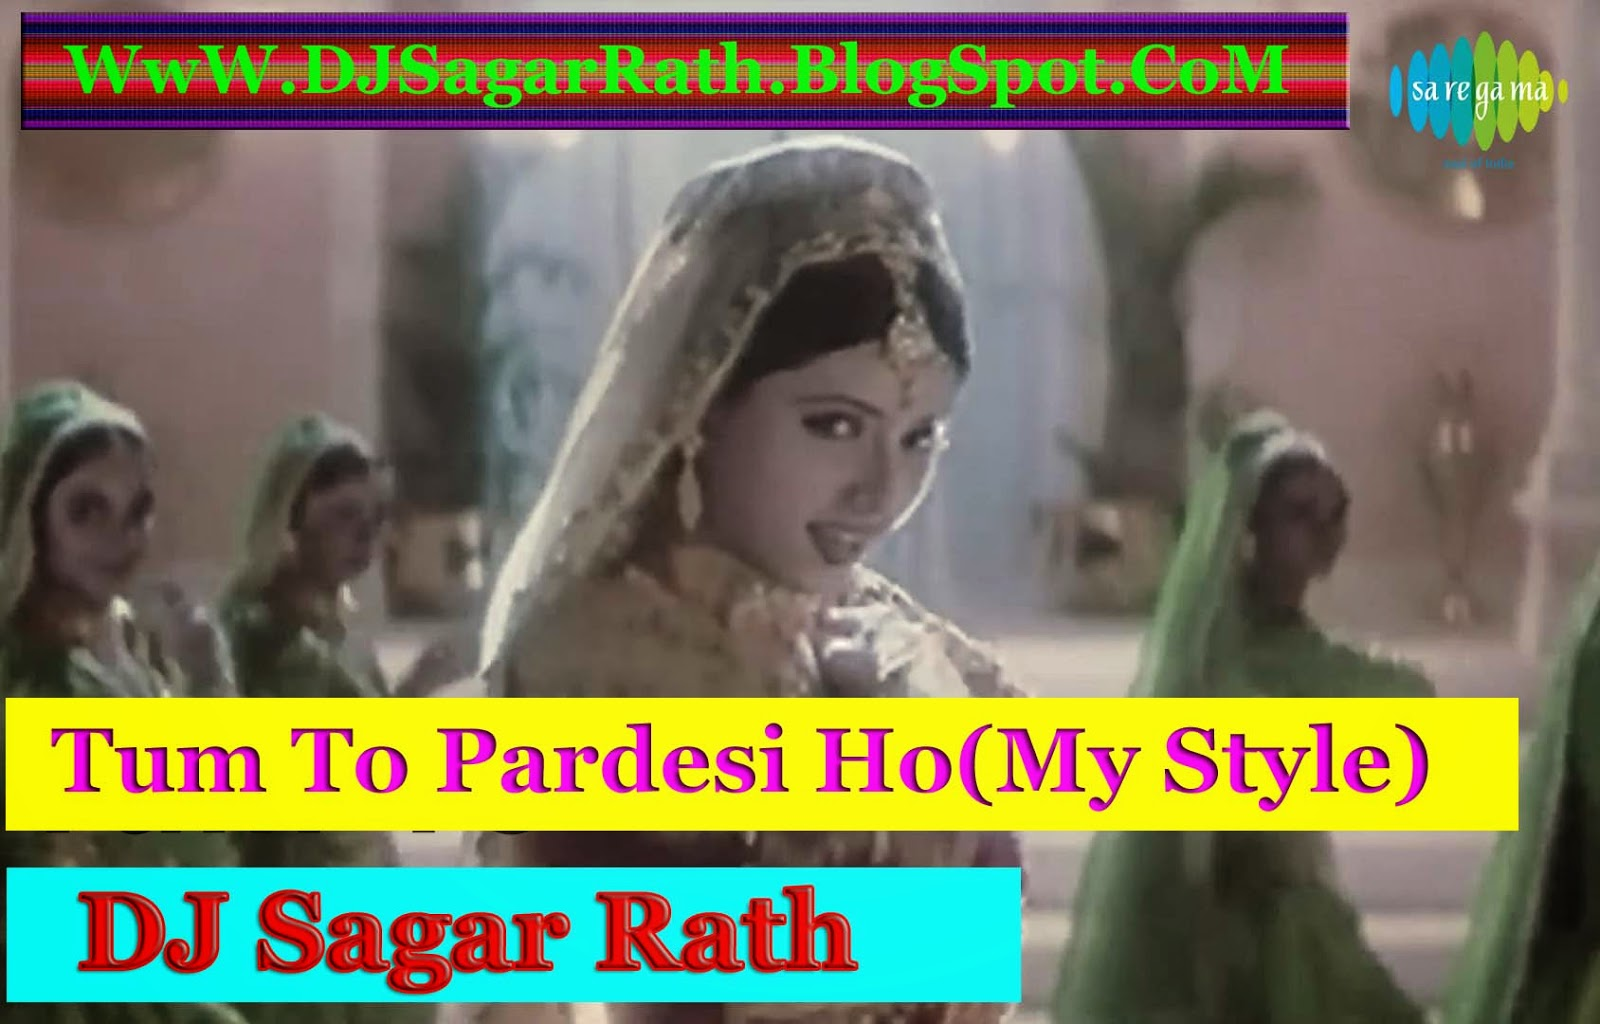 DJ Sagar Rath